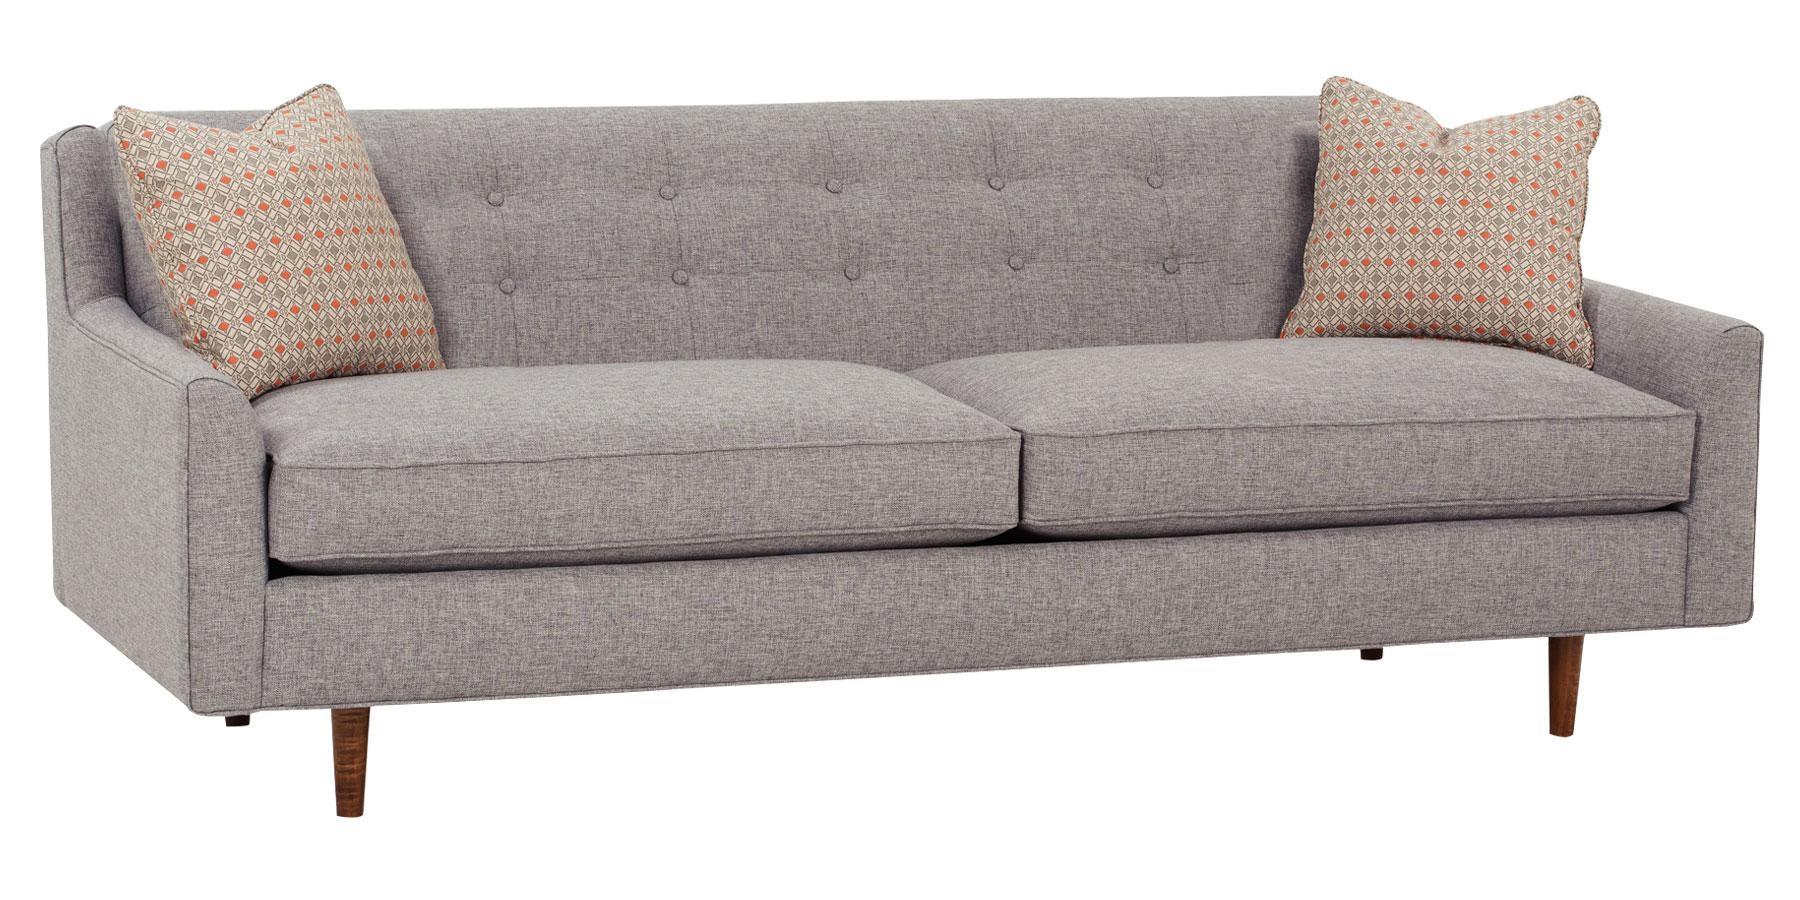 Sofas: Danish Modern Sleeper Sofa | Mid Century Modern Sofas Under Regarding Danish Modern Sofas (View 5 of 20)